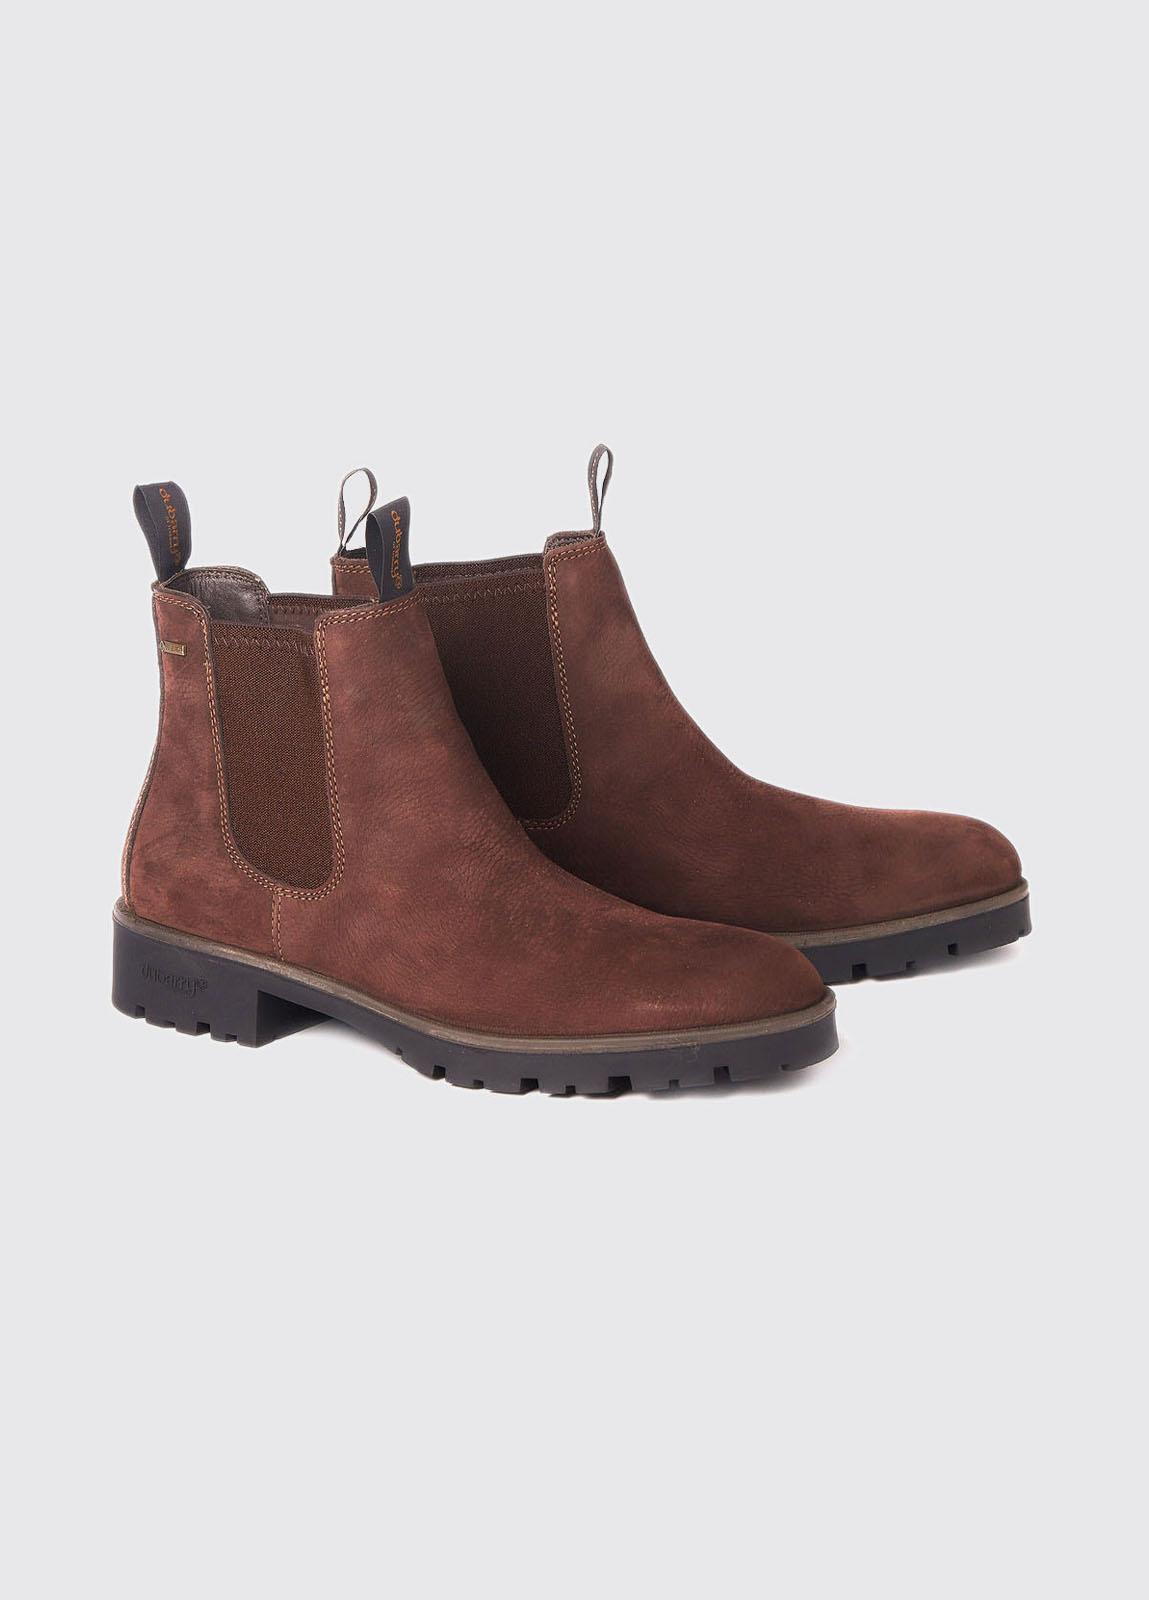 Antrim Country Boot - Java